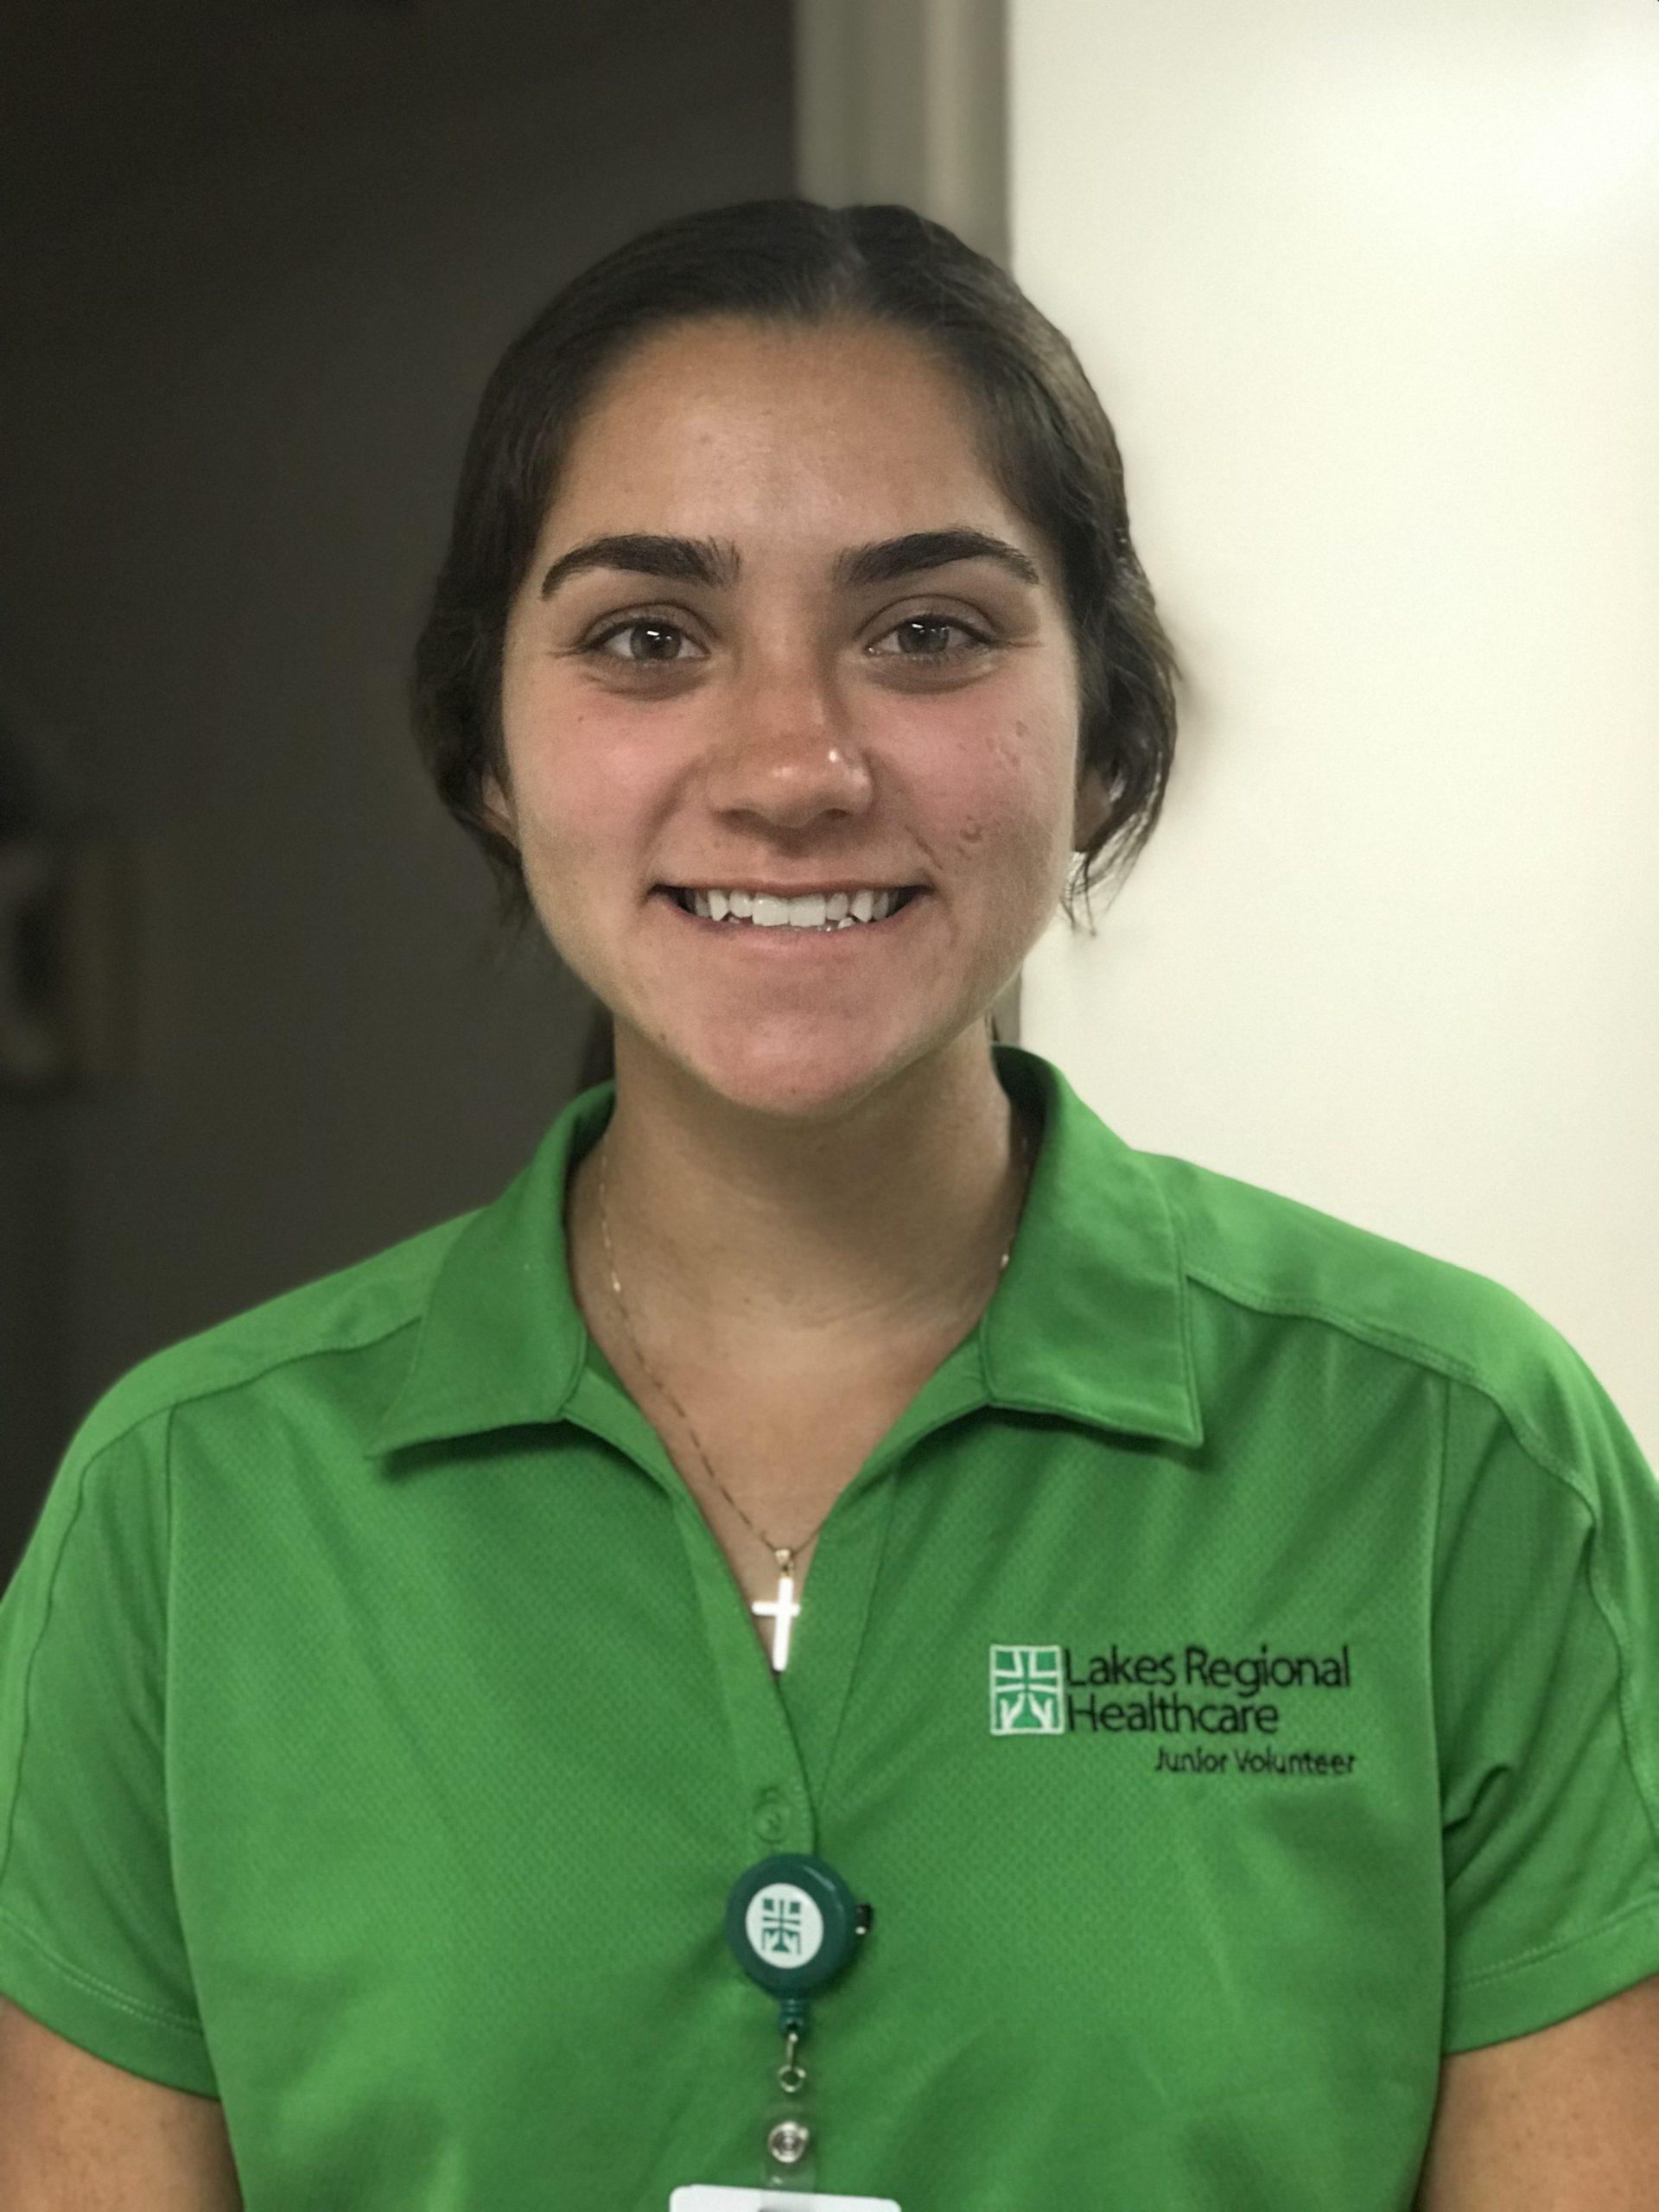 Young female volunteer